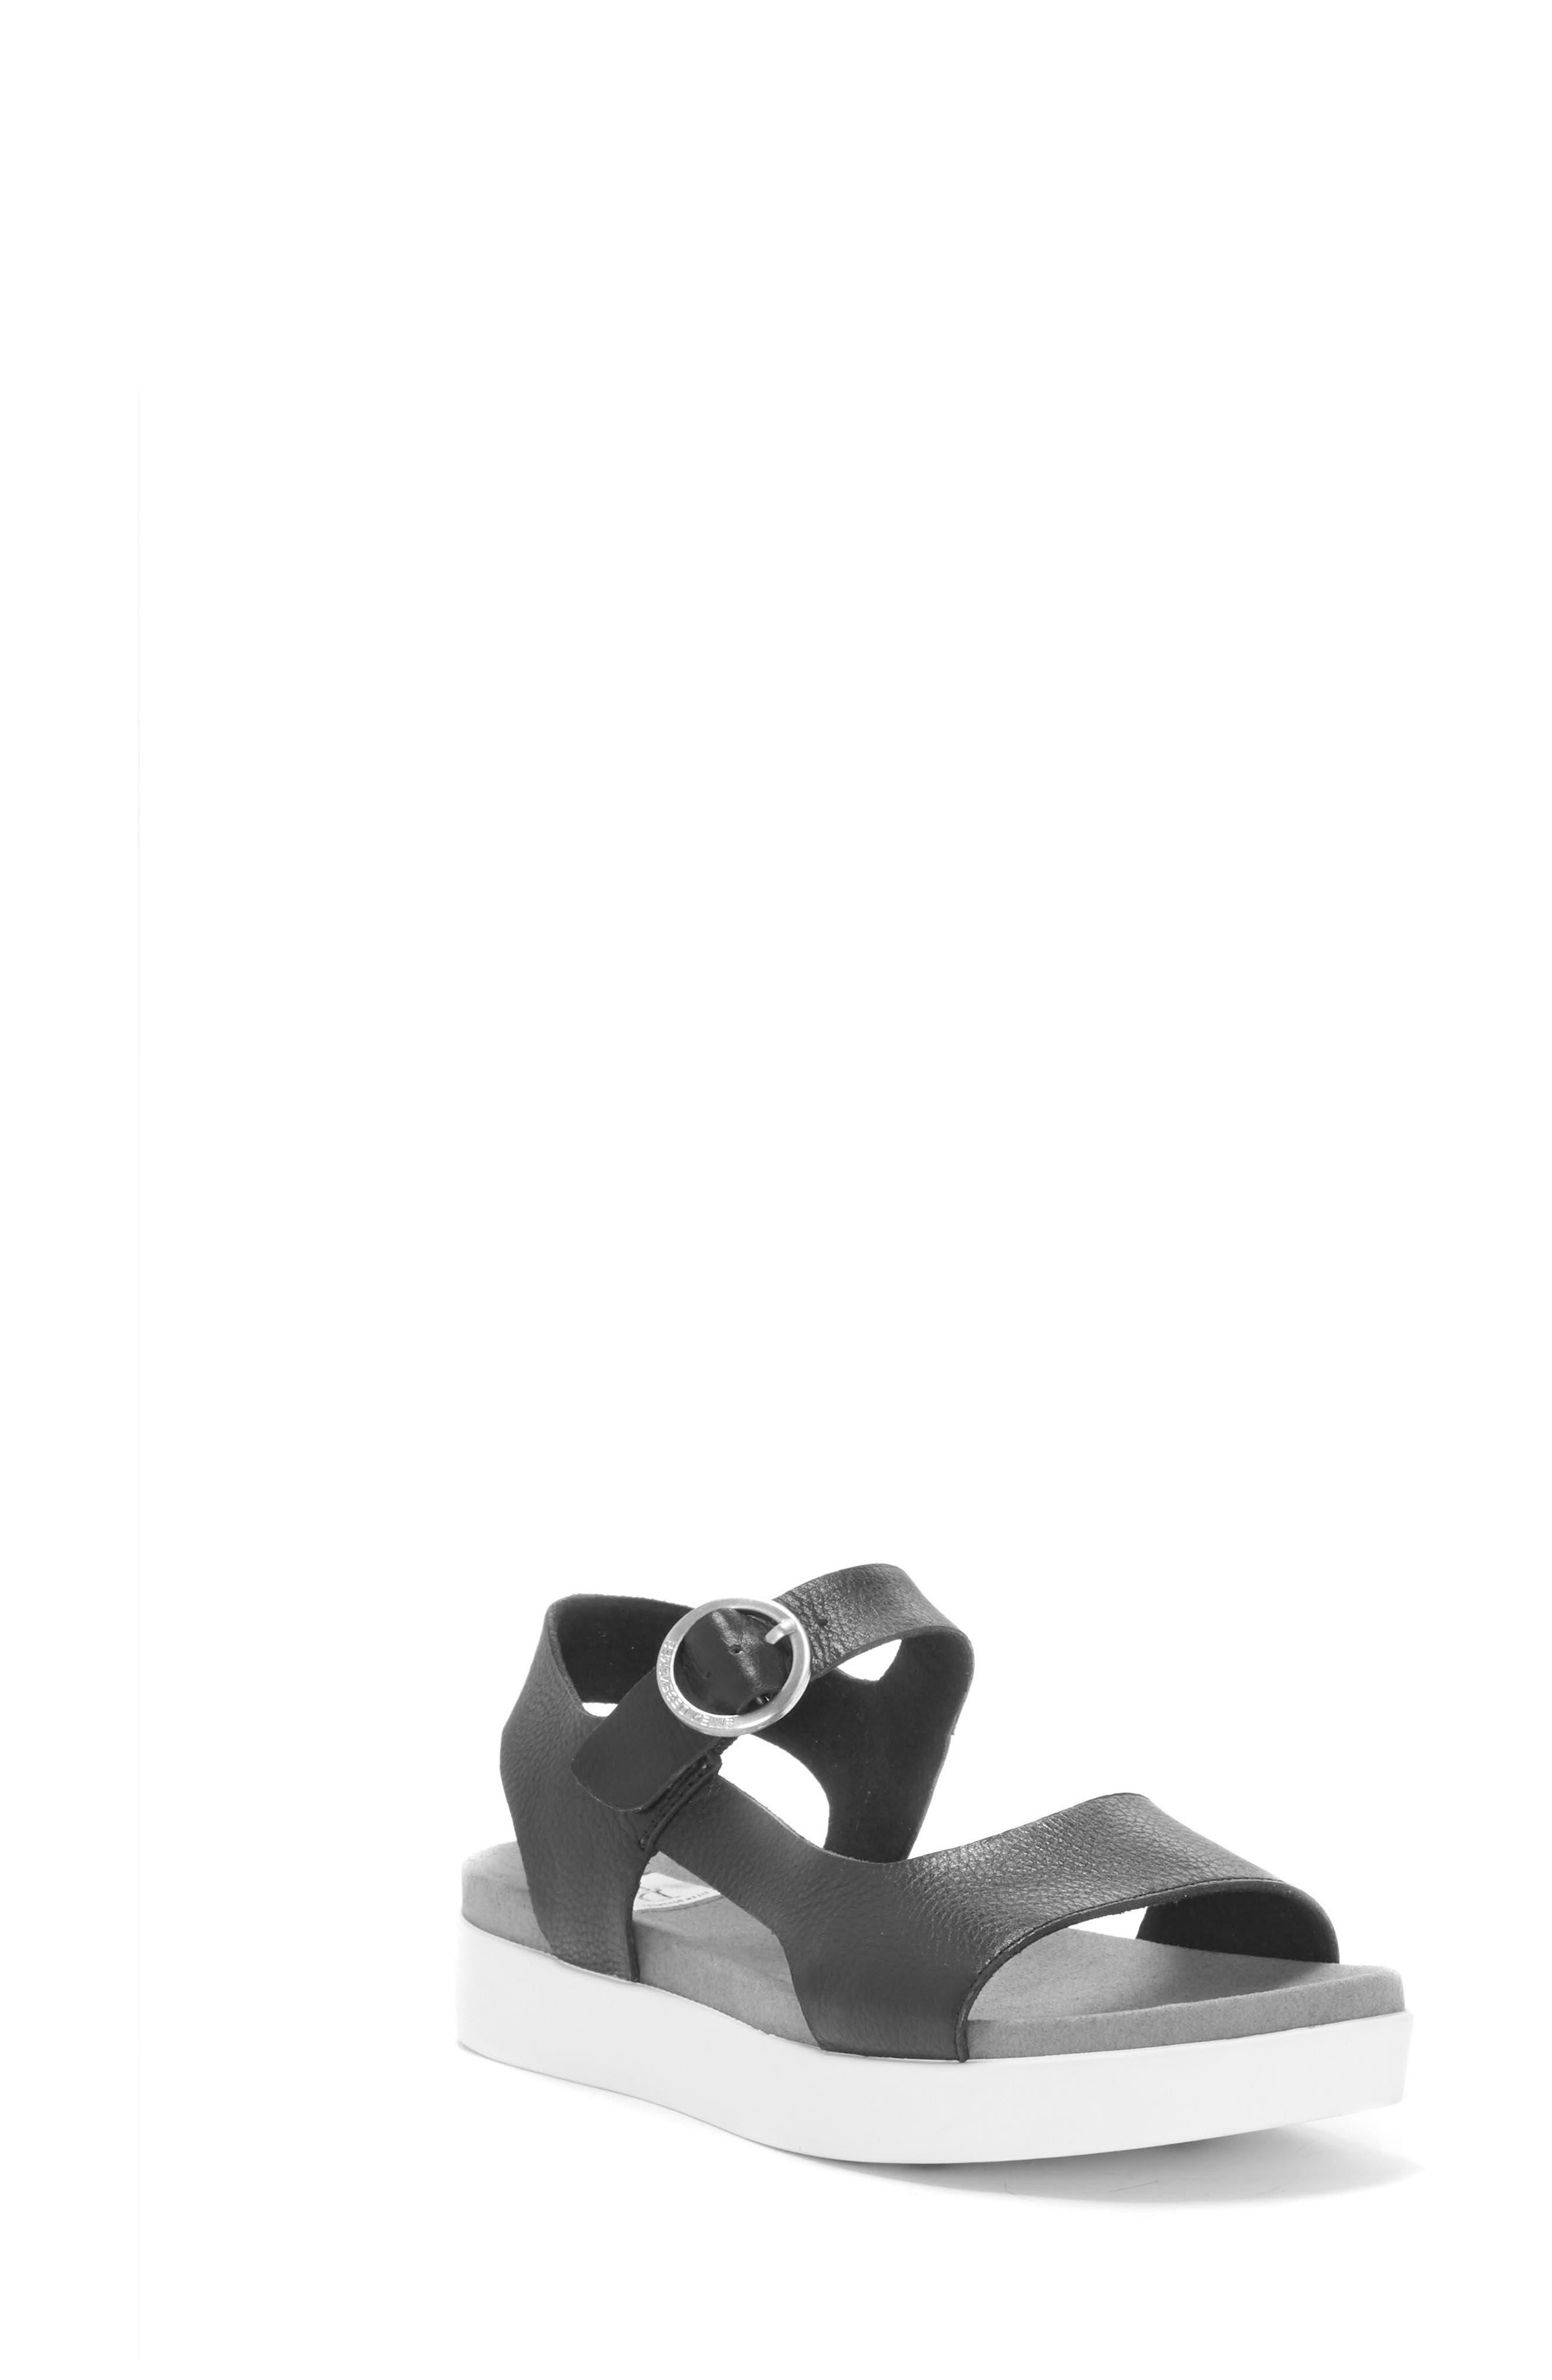 Caspin Sandal,                             Main thumbnail 1, color,                             Black Leather